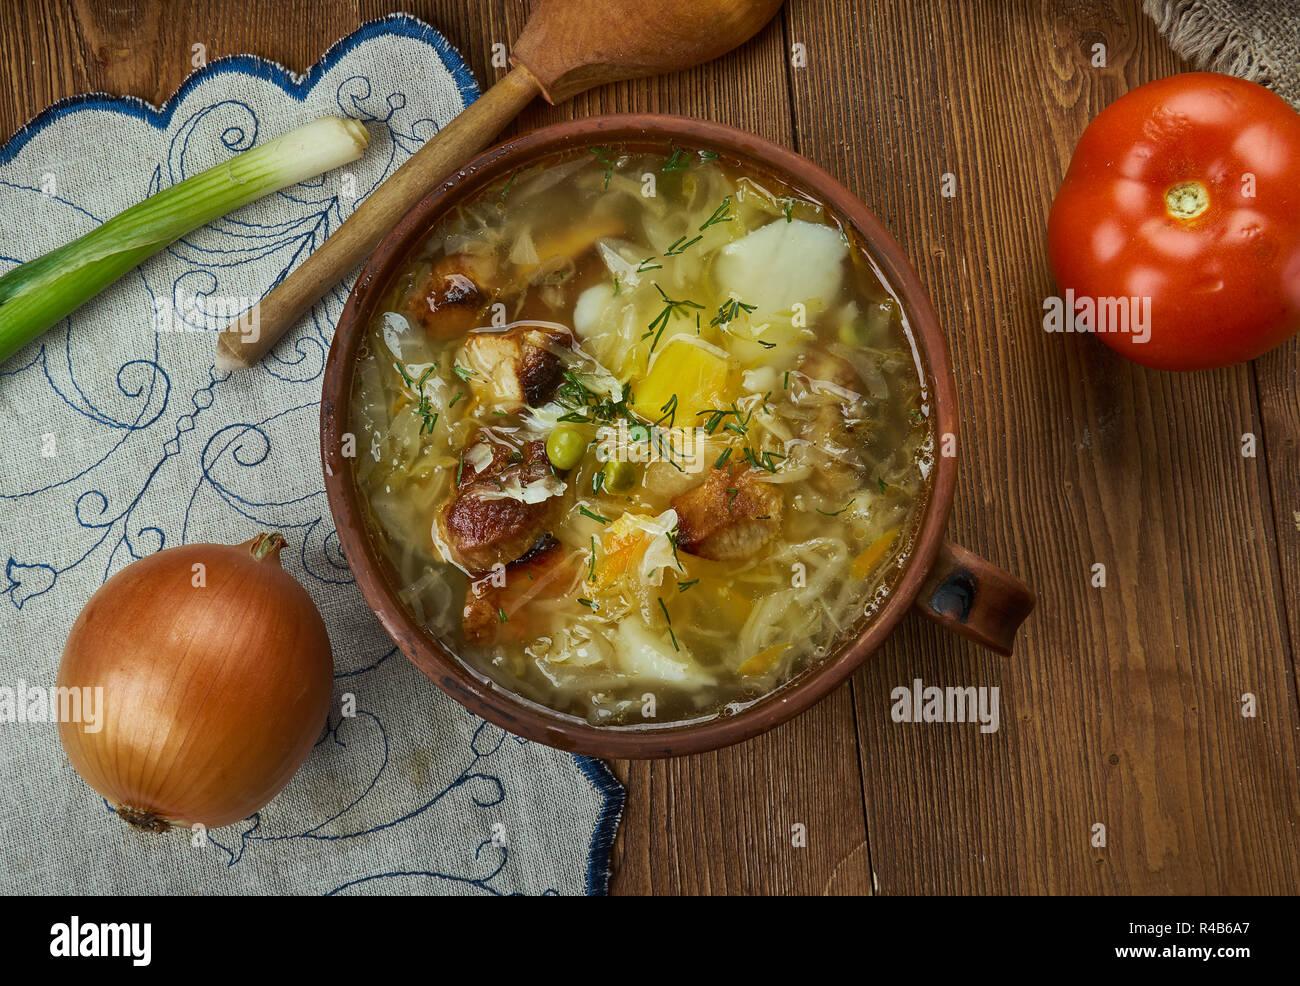 Cocina Checa | Zelnacka Bohemio Sopa De Col Tradicional Cocina Checa Platos